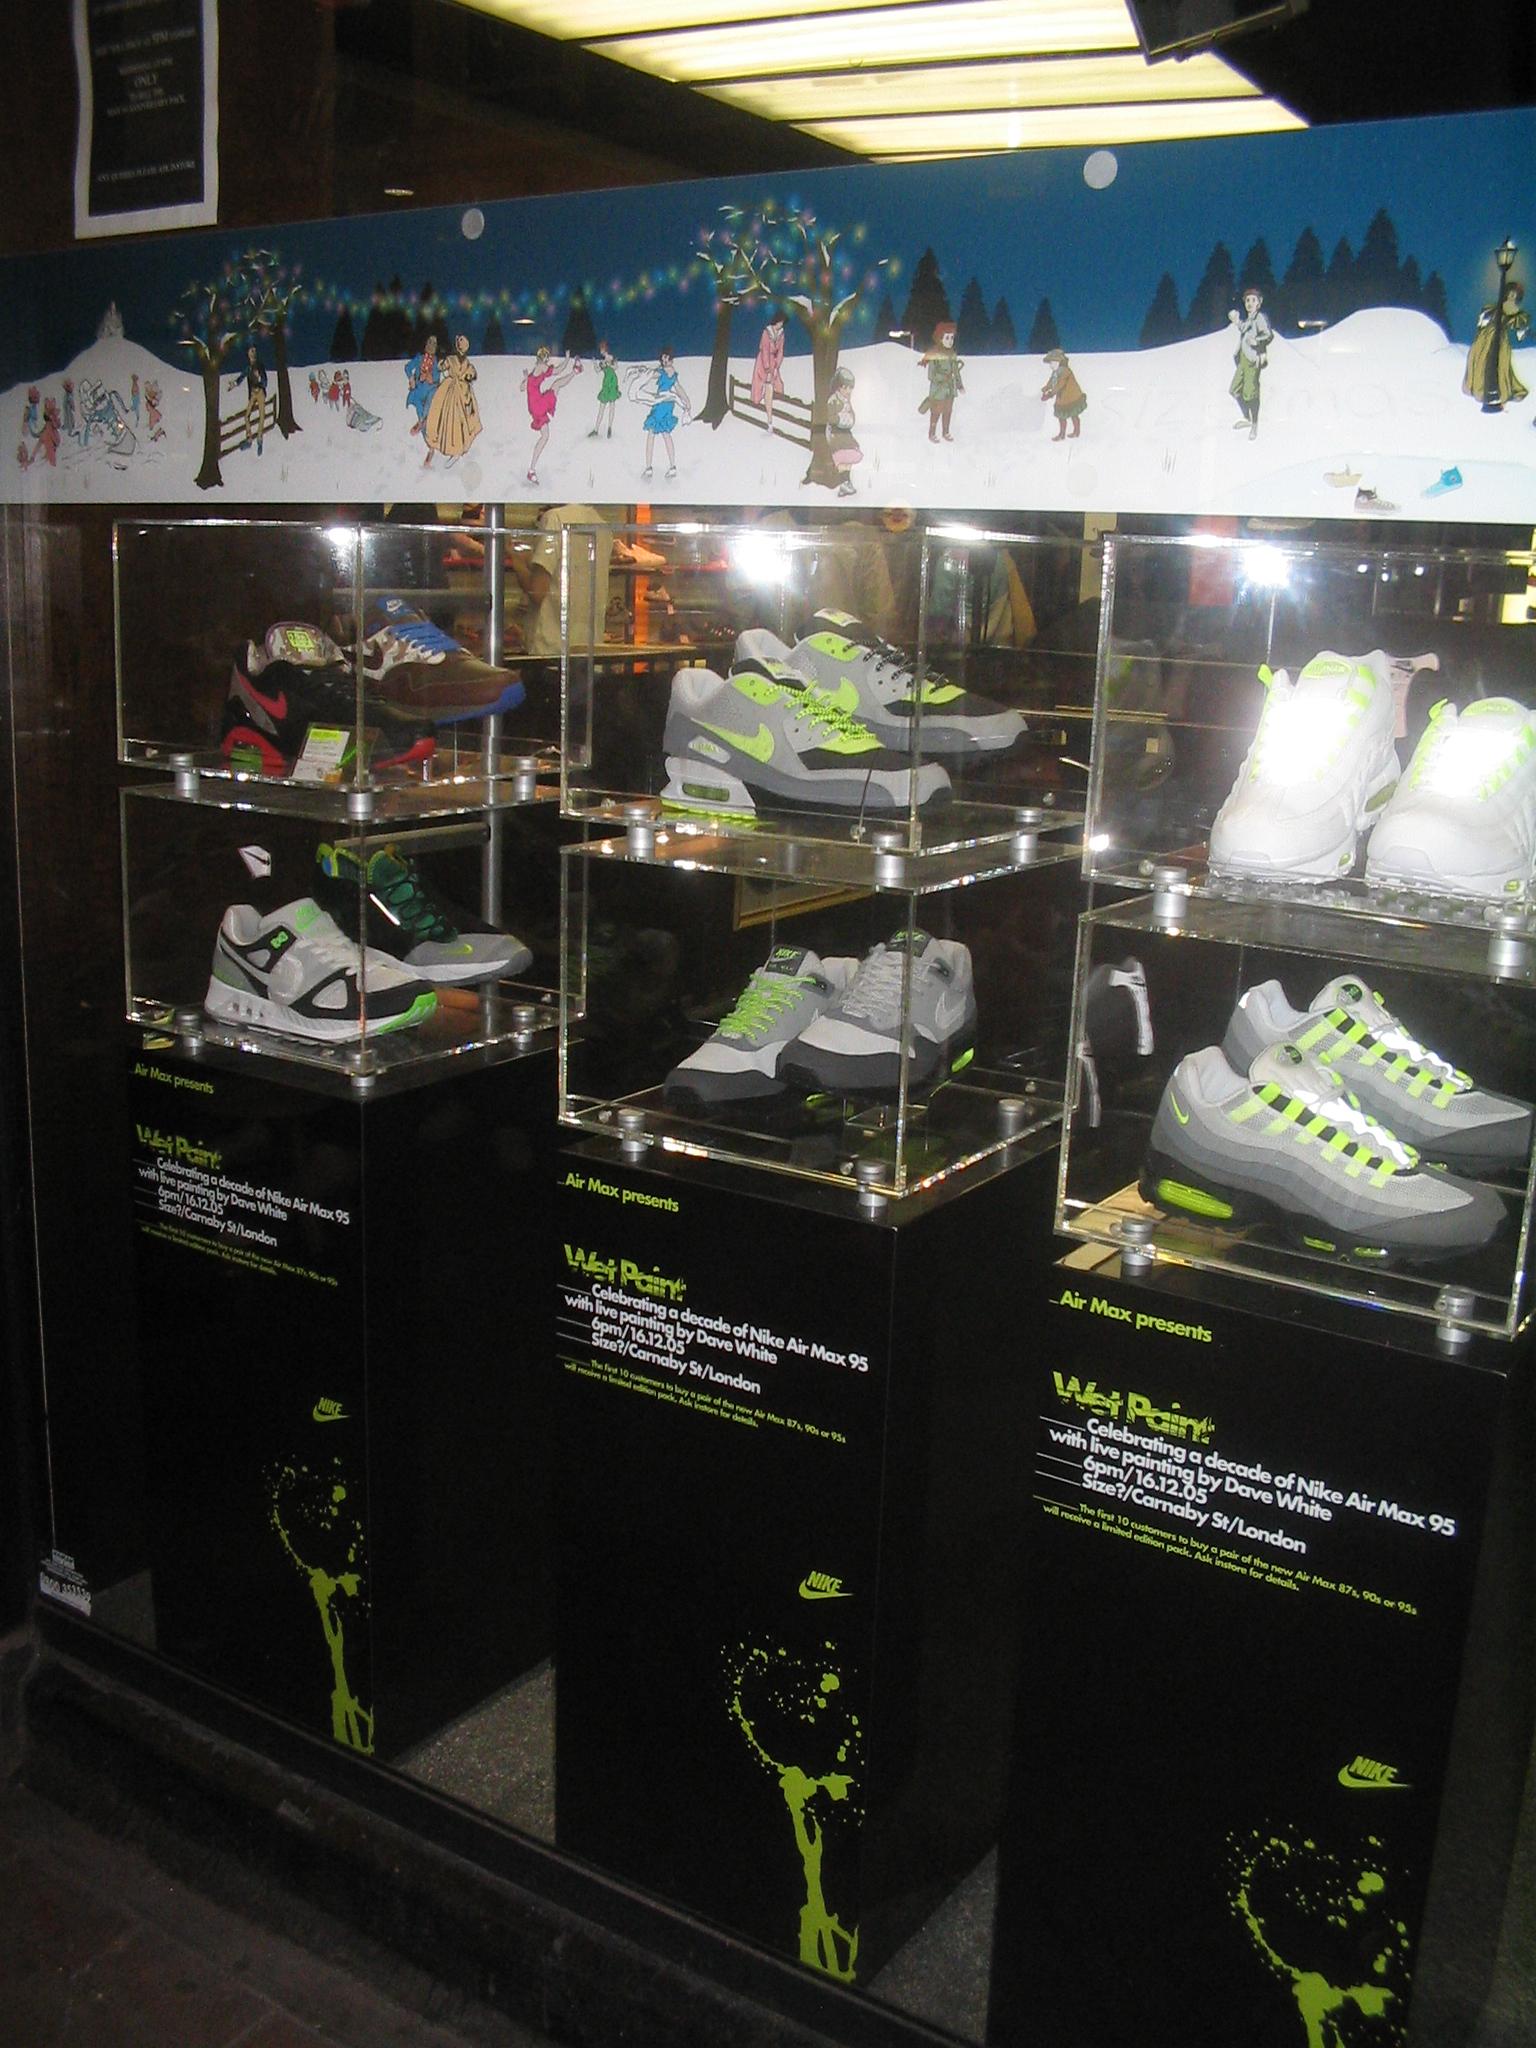 displaymemospics 039